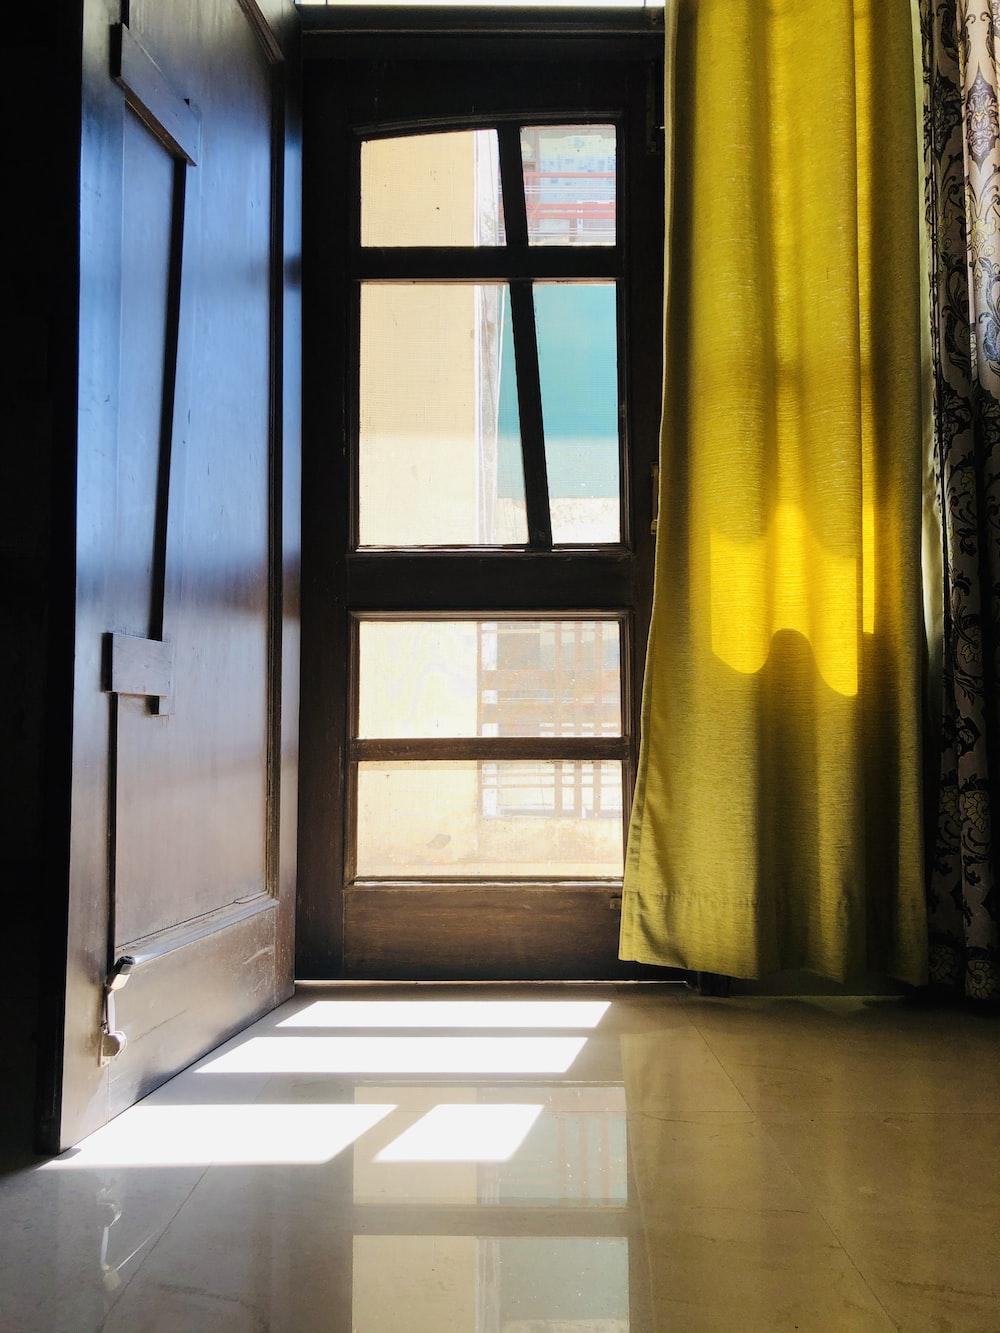 brown wooden door with yellow curtain